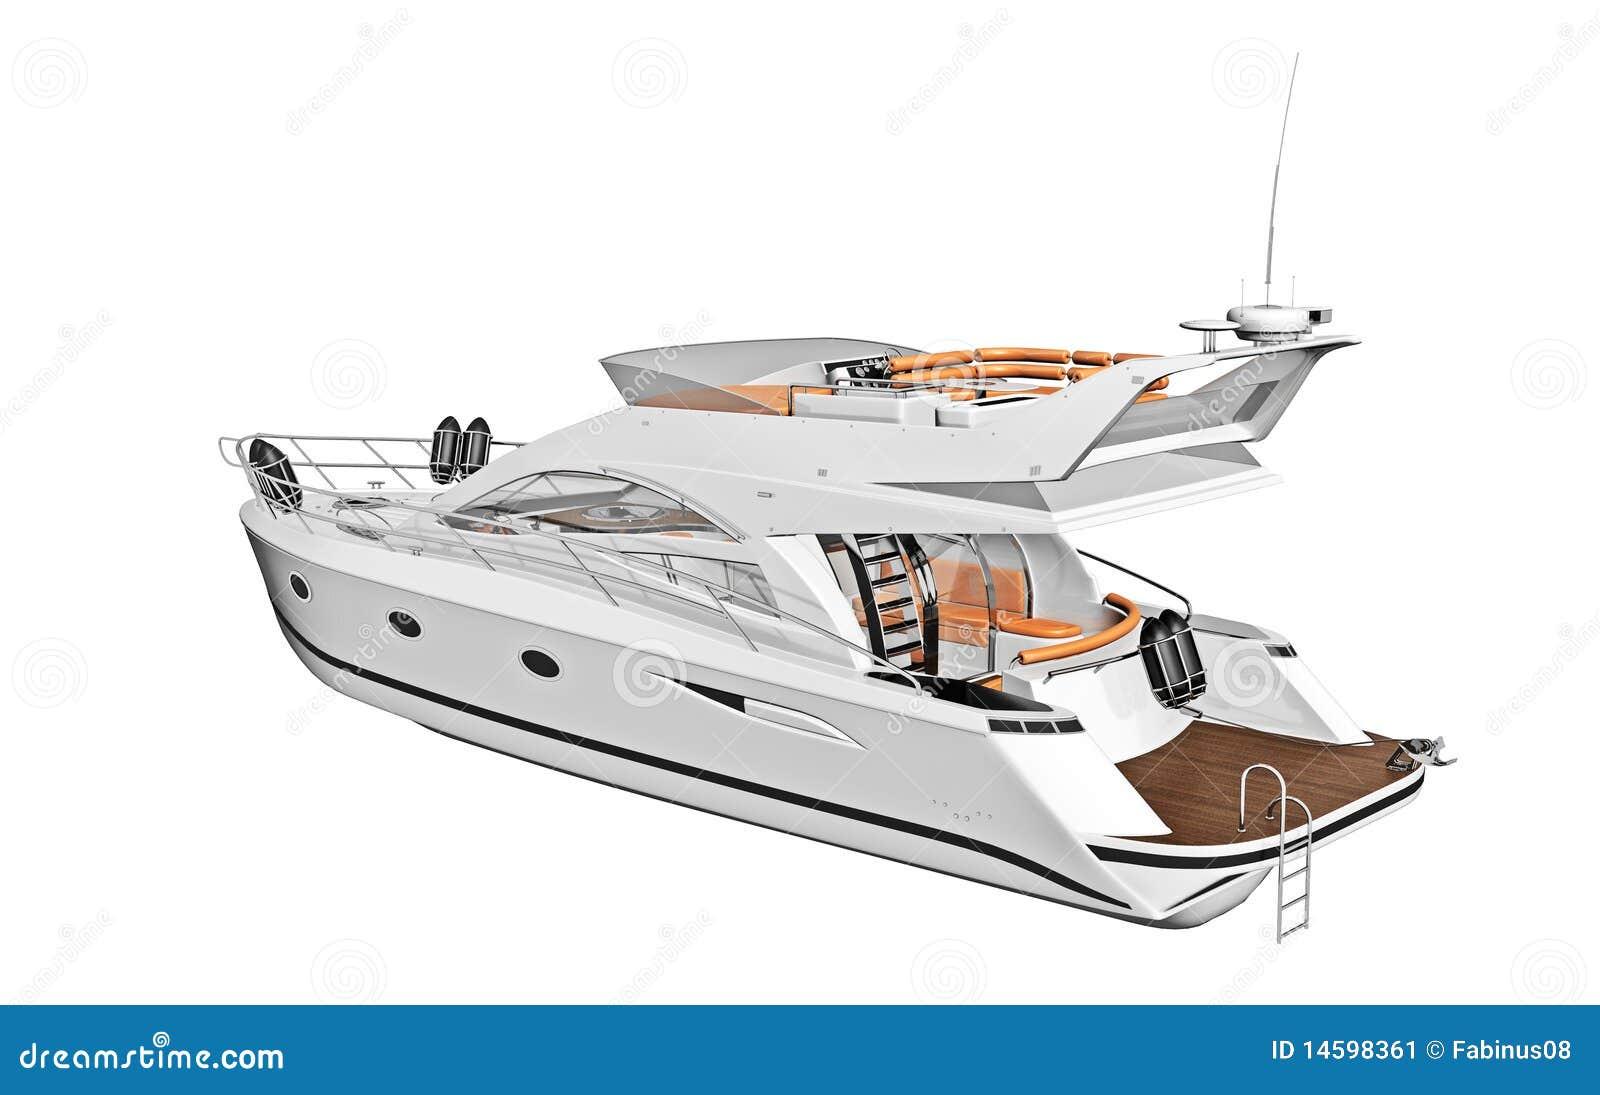 ... boat plans cabin cruiser boats model boat plans 25 foot cabin cruiser